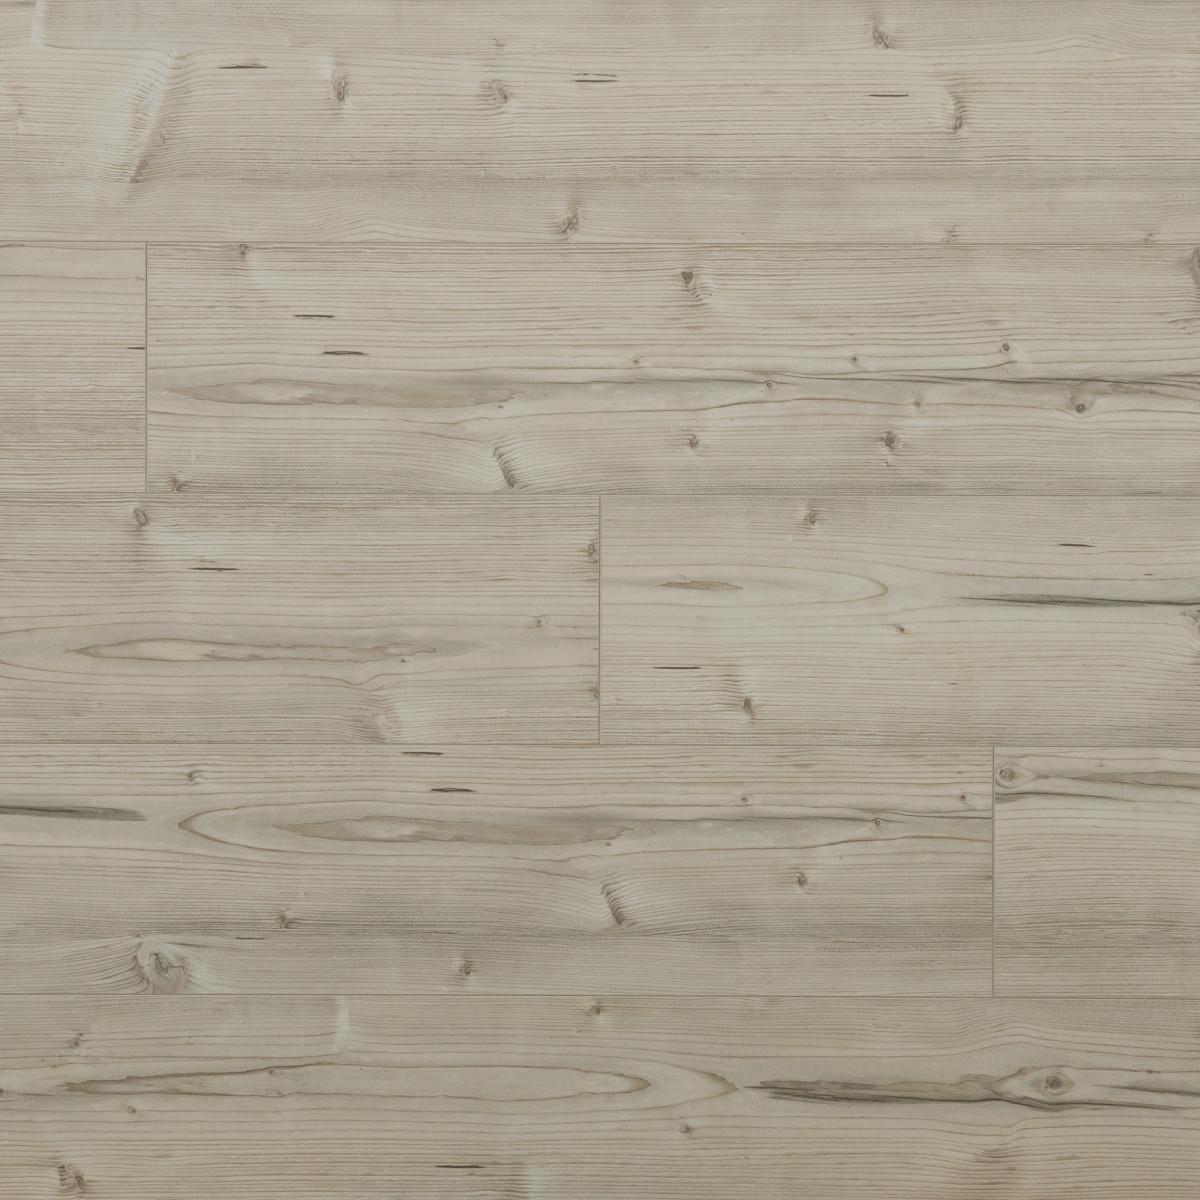 Ламинат Artens Сосна Арида 33 класс толщина 8 мм 2.131 м²